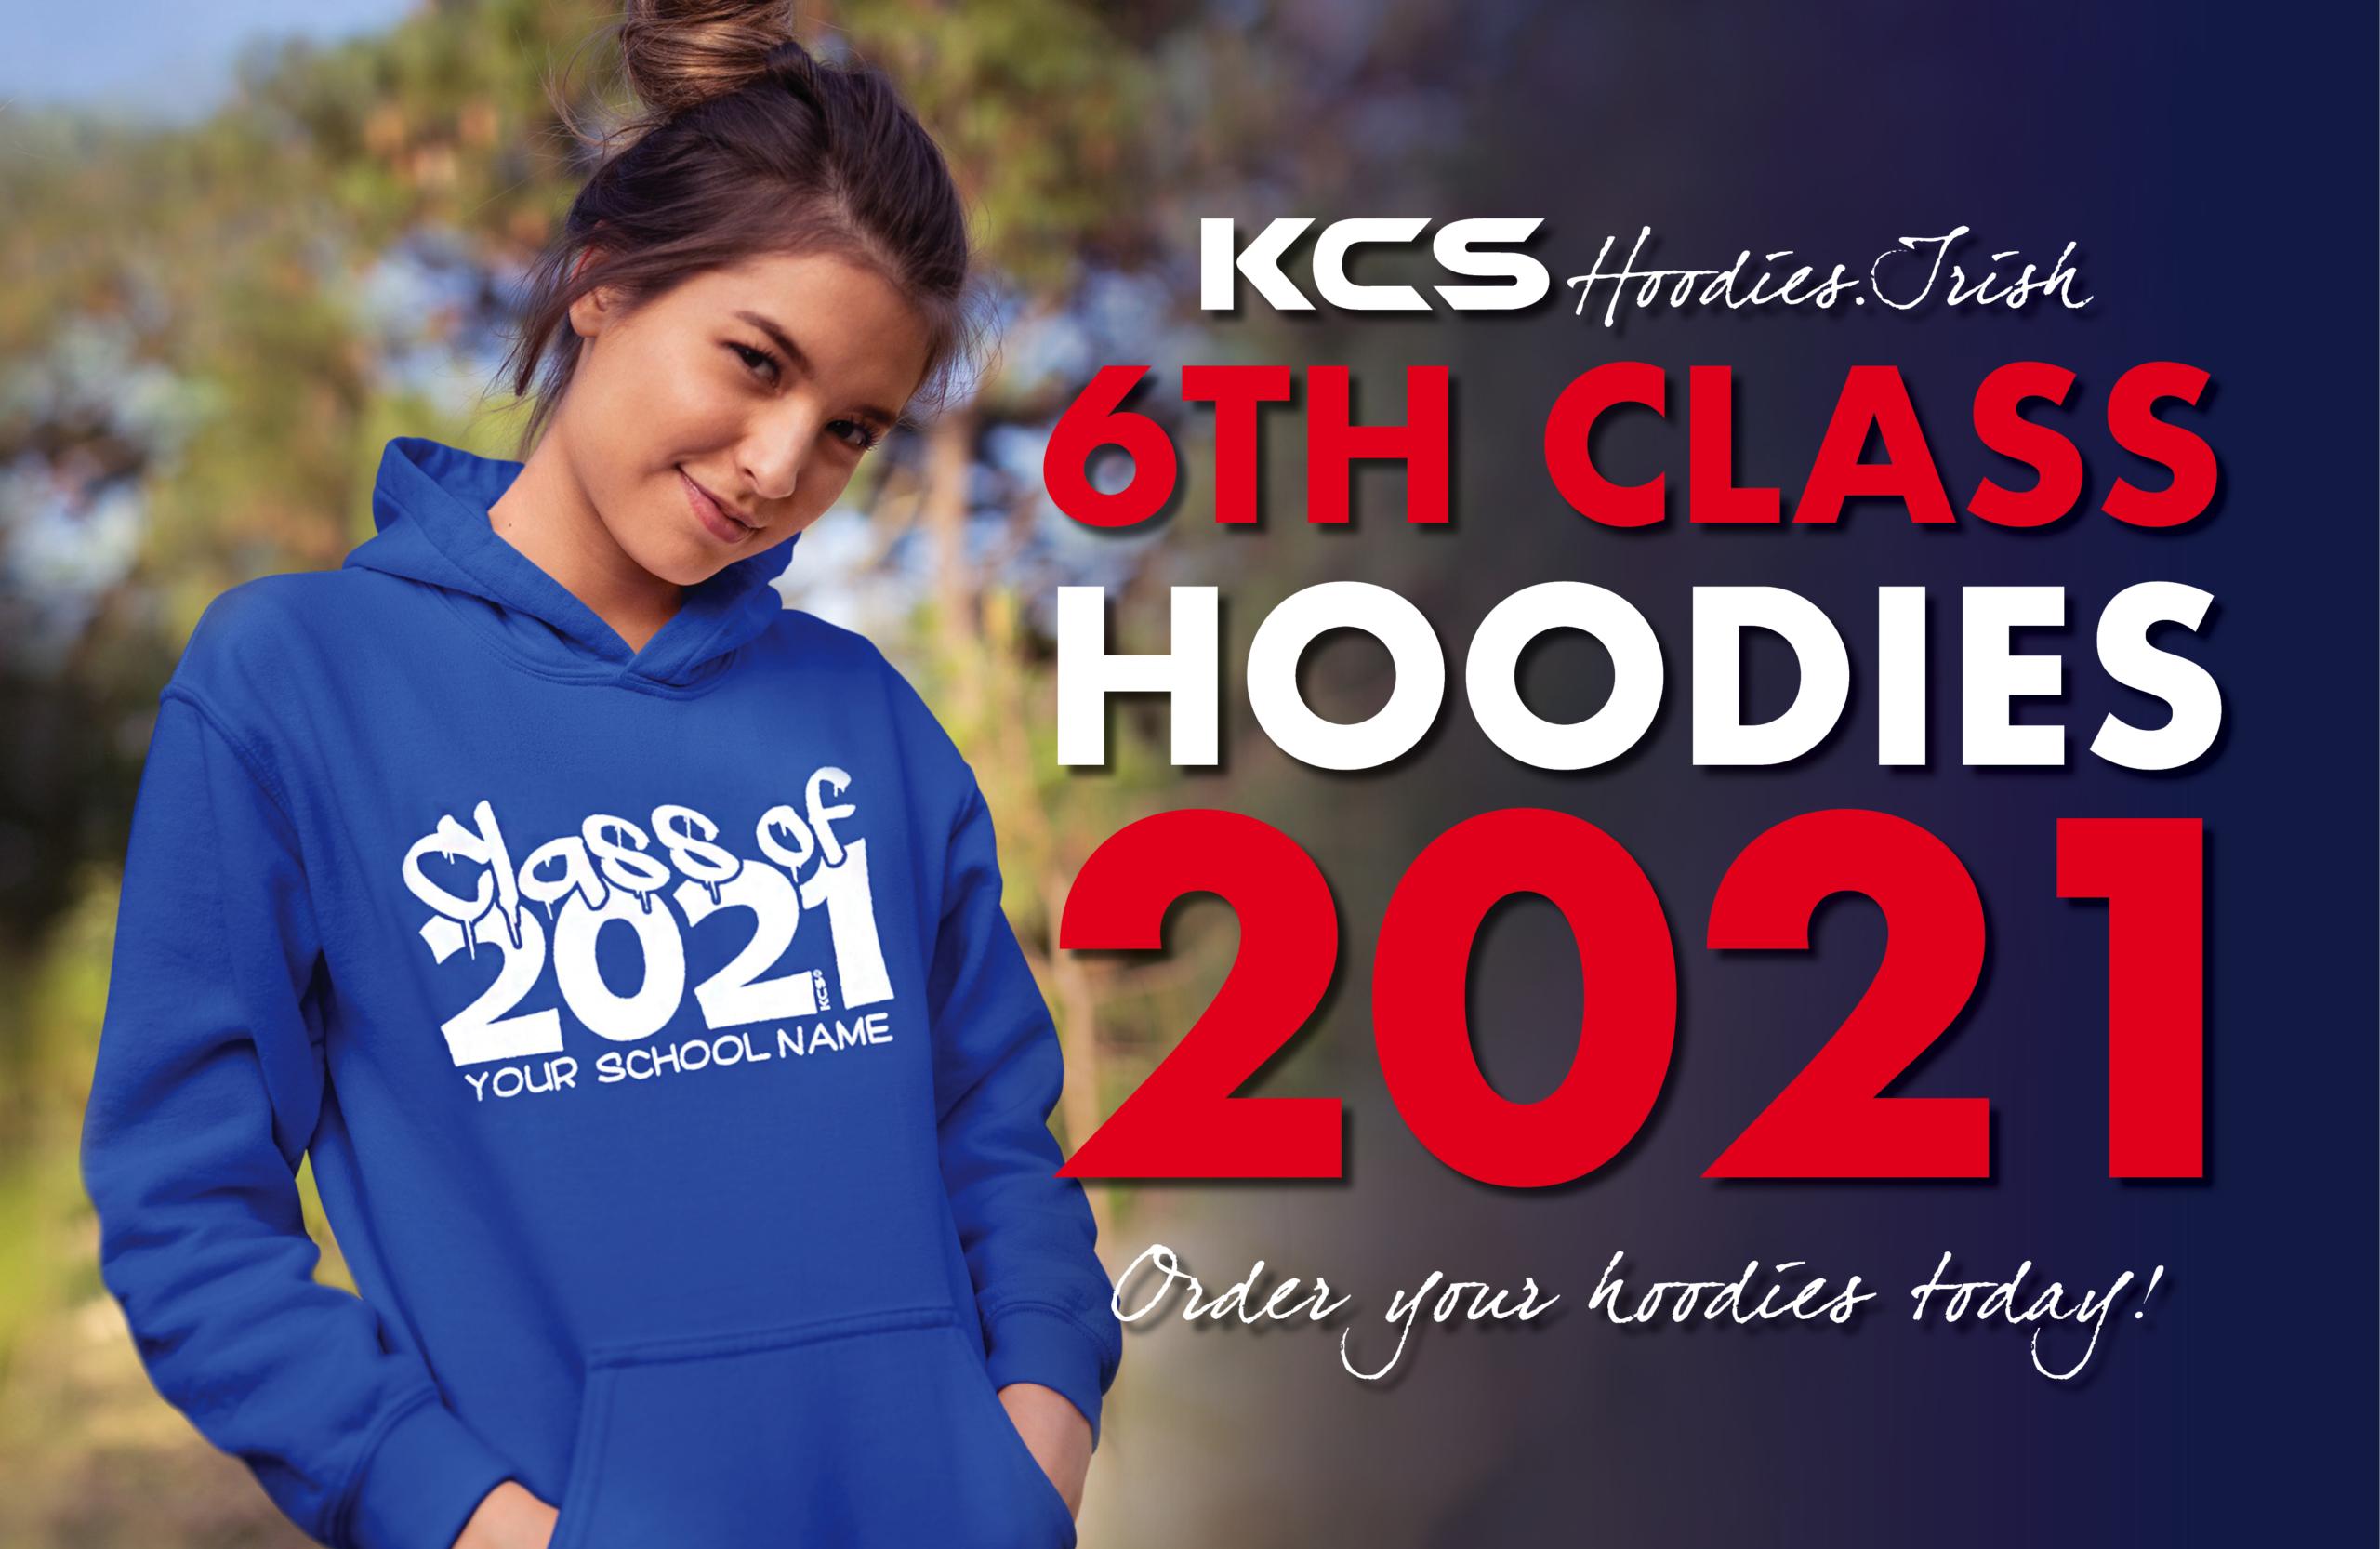 6th class hoodies